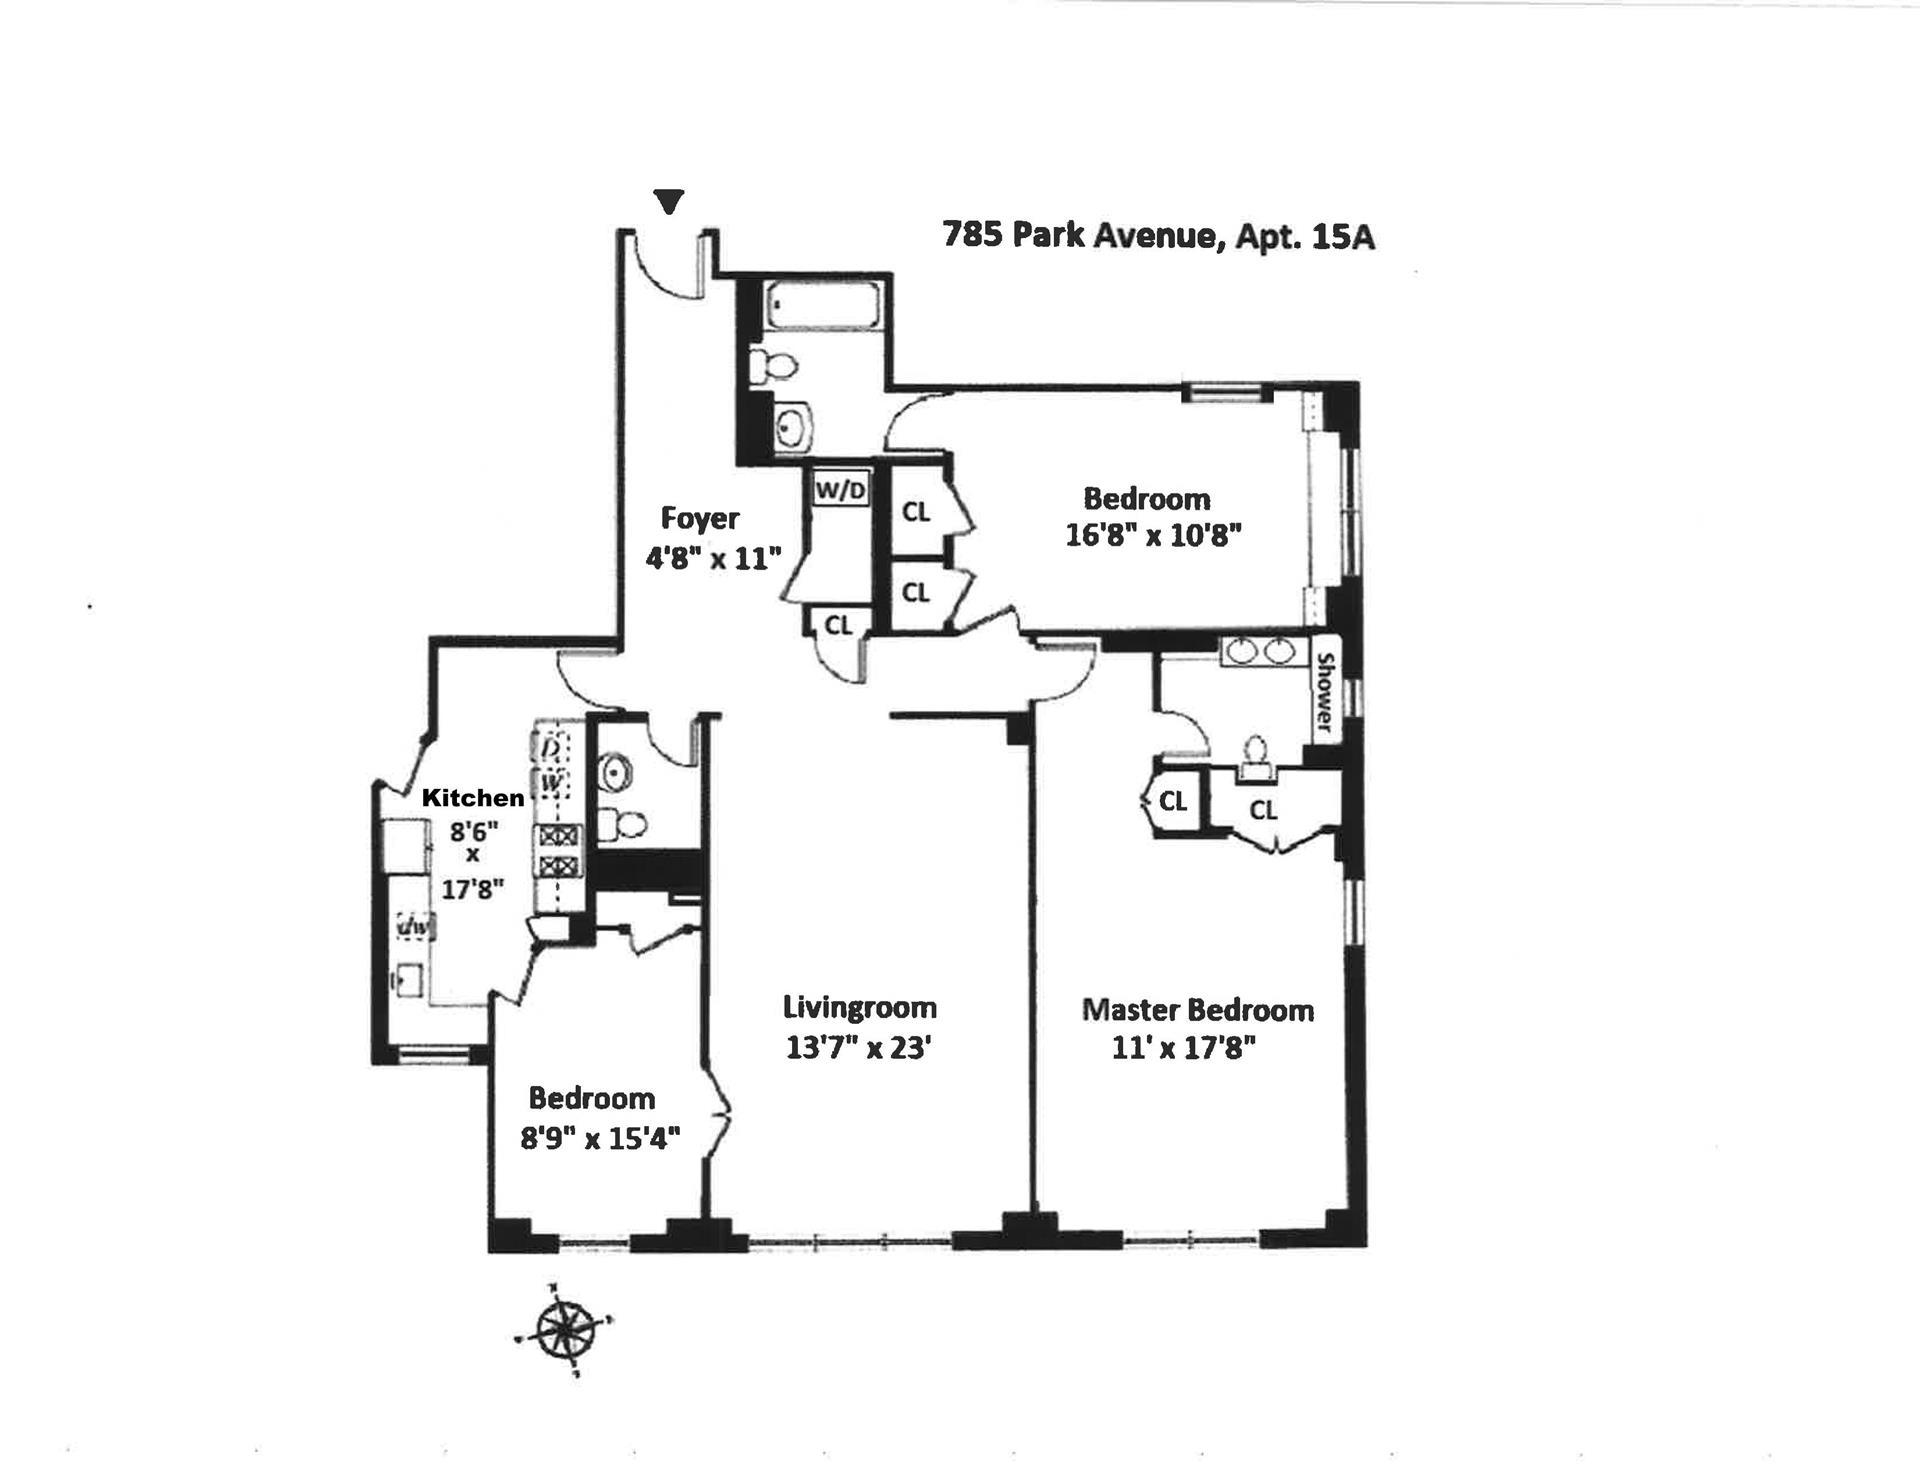 Floor plan of 785 Park Avenue, 15A - Upper East Side, New York